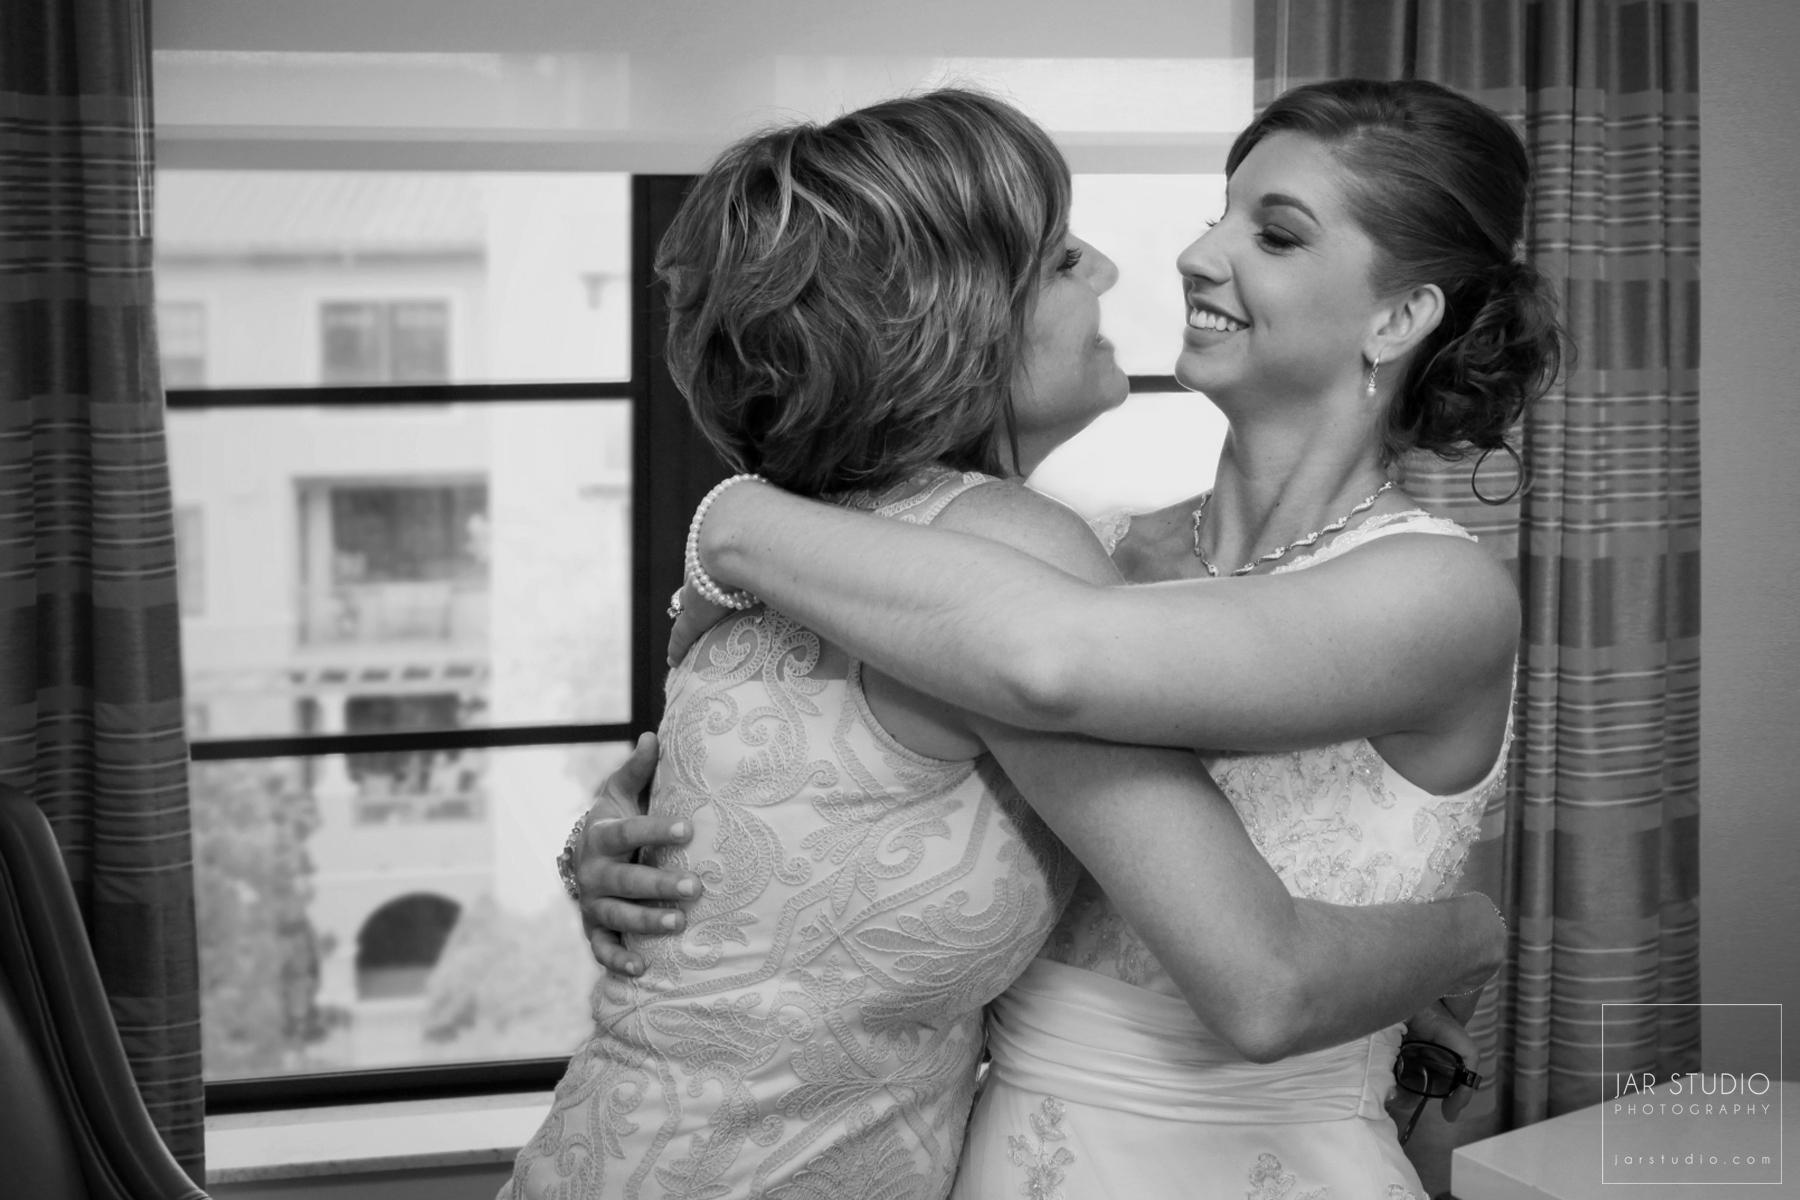 07-mother-bride-wedding-day-alfond-inn-rollins-jarstudio-photography.JPG